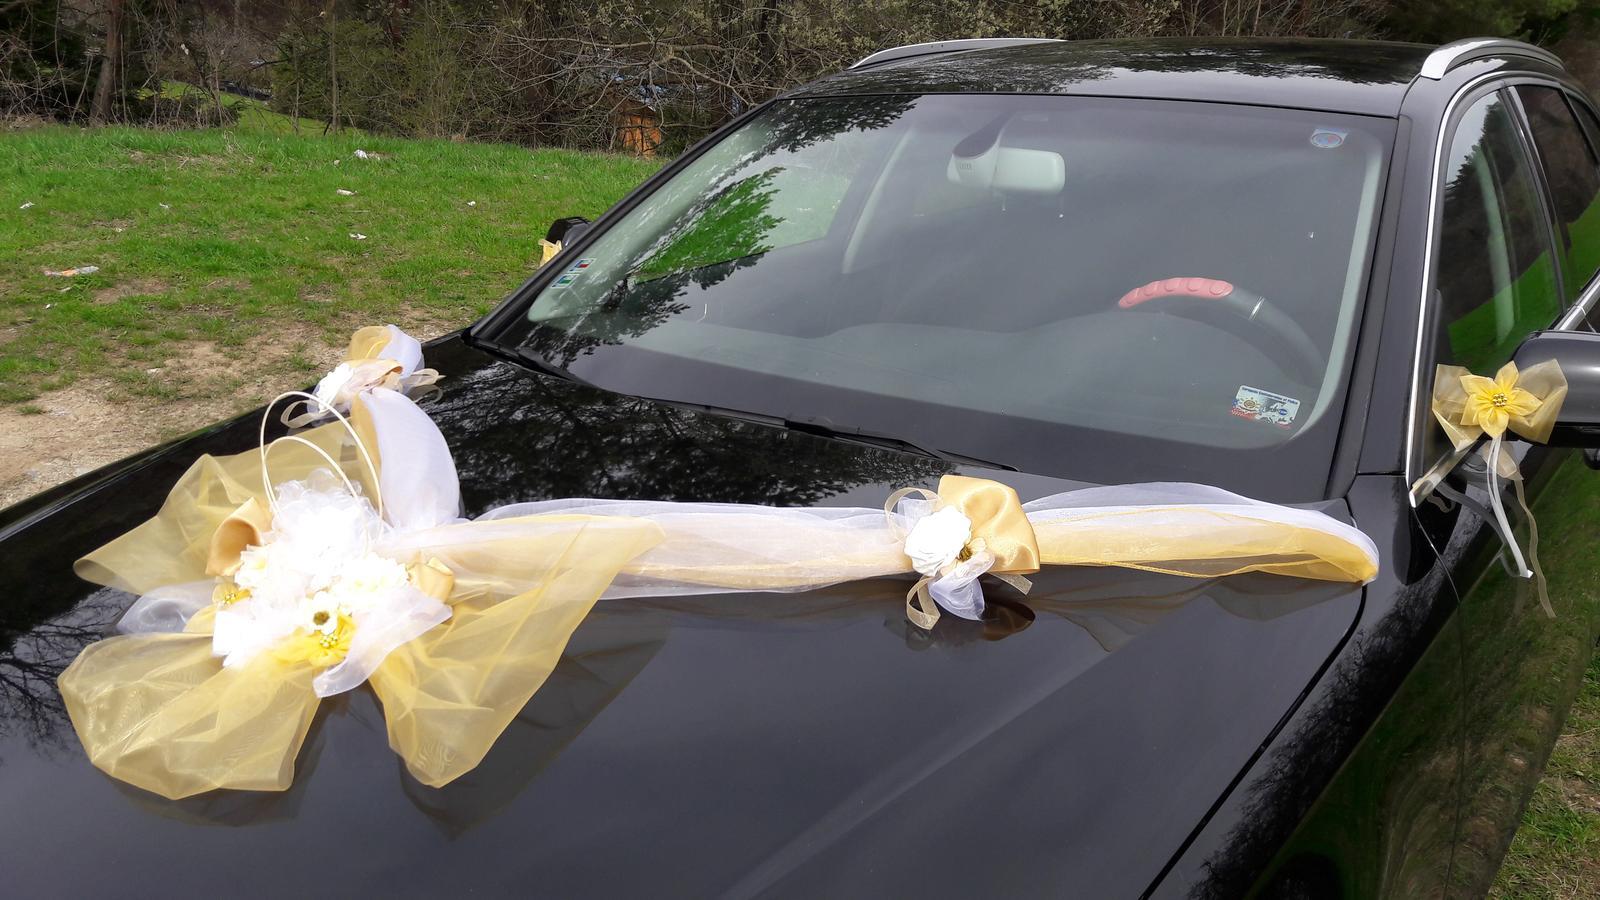 Výzdoba na kapotu auta - Obrázok č. 1